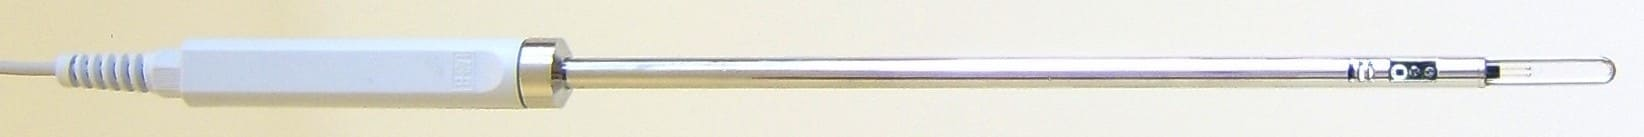 Termo-higro-anemometr LB-584